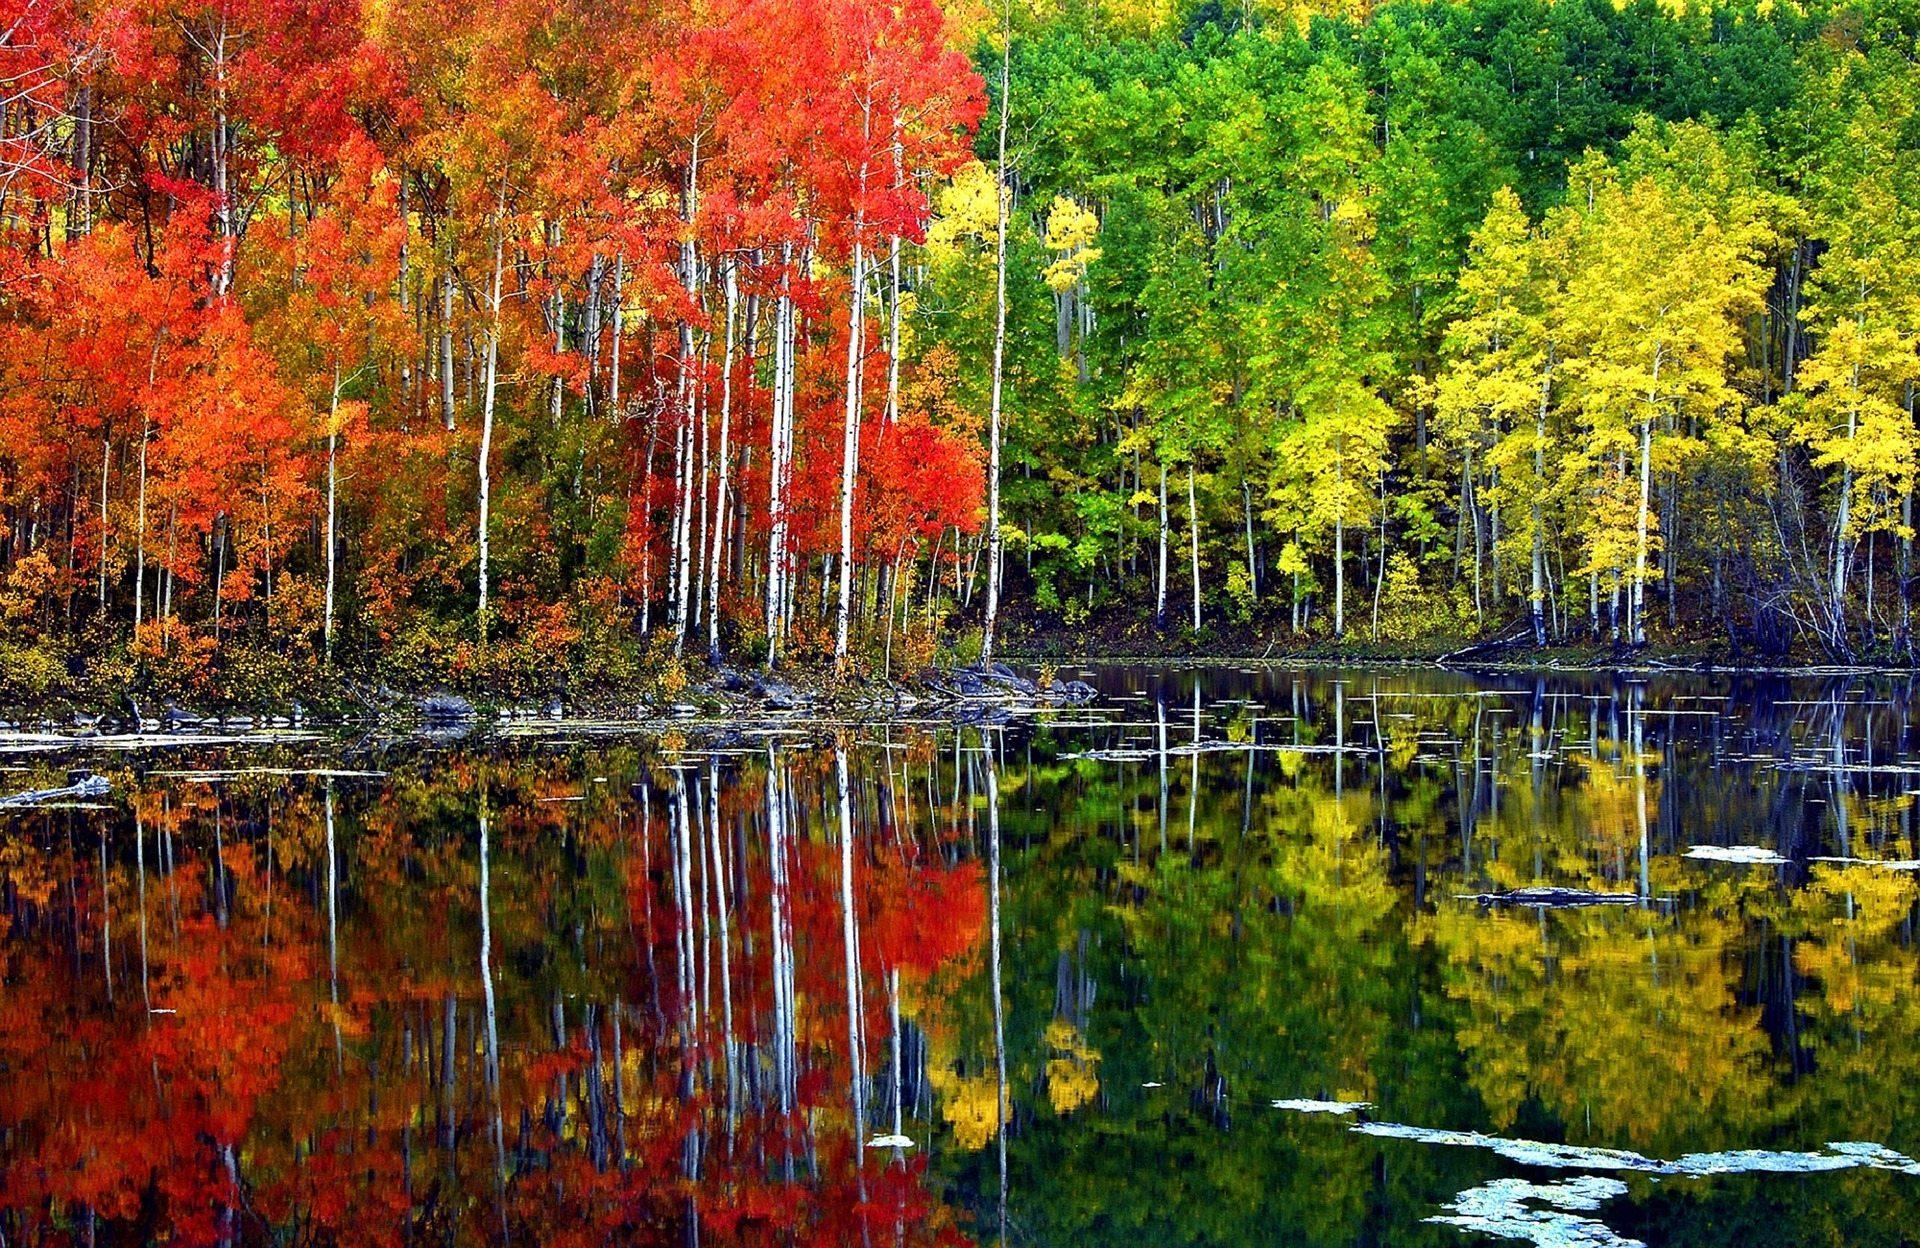 Aspen Tree Wallpaper HD for Download 1920x1248